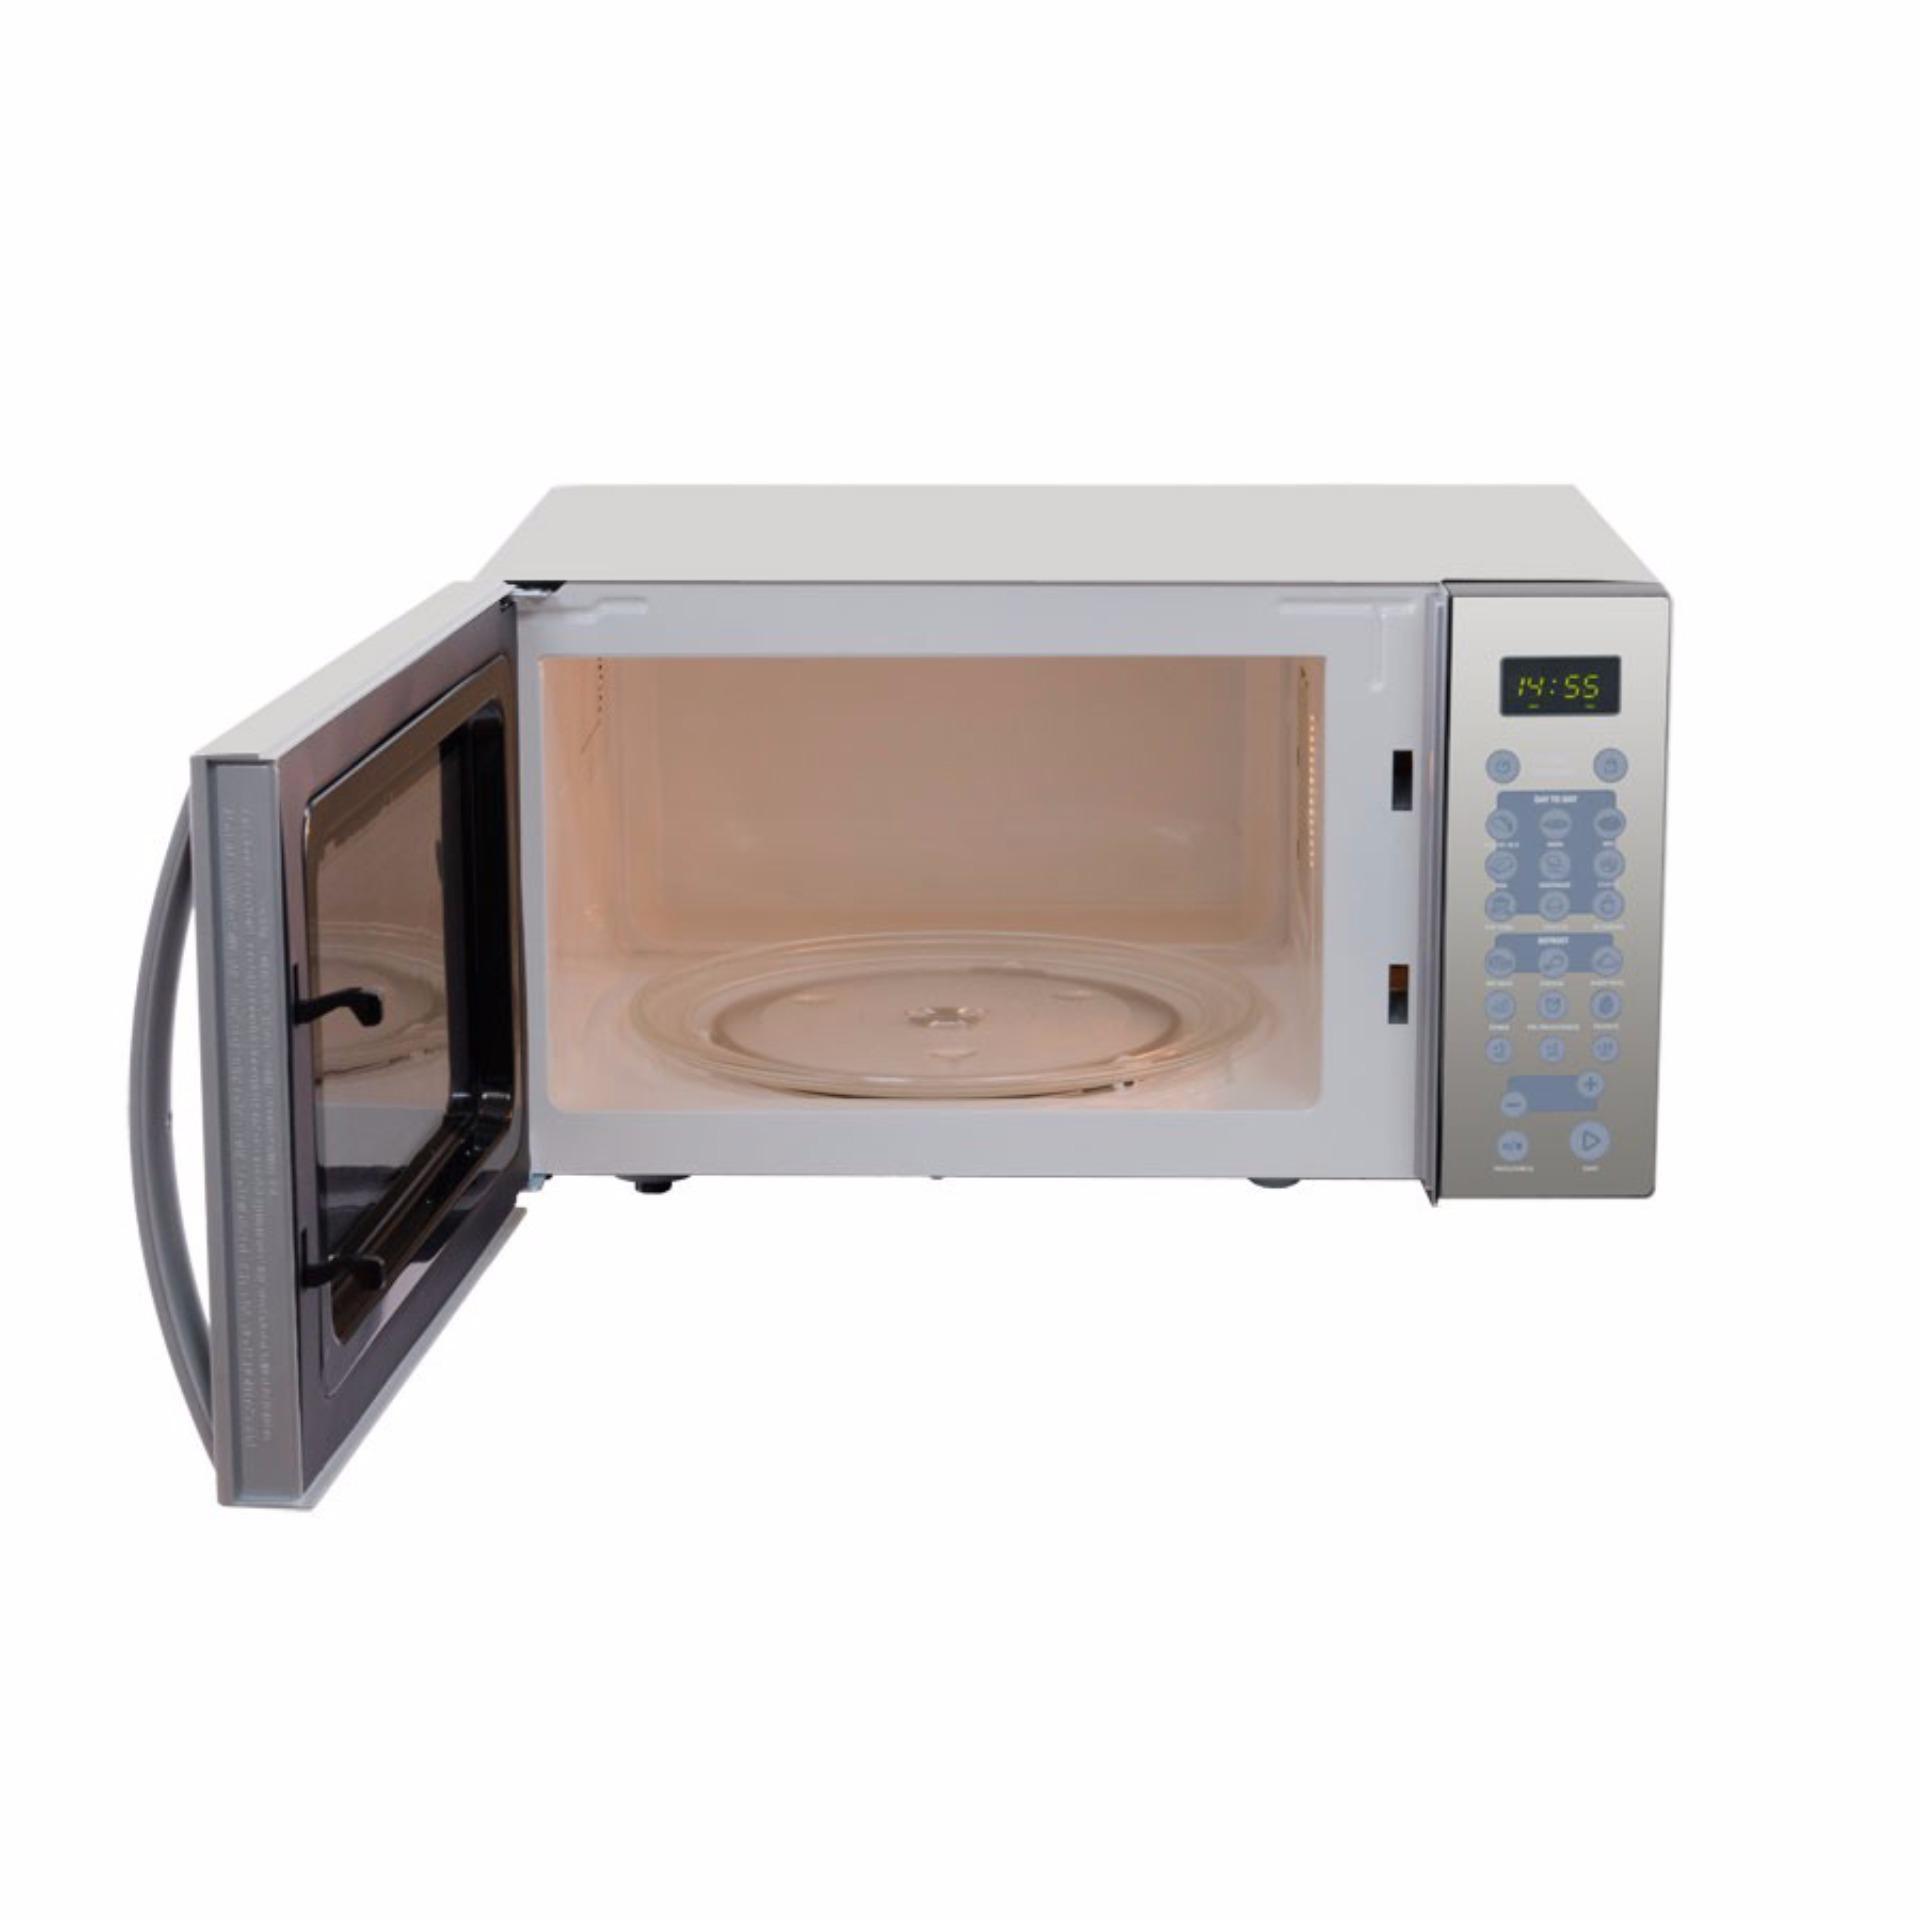 Whirlpool Microwave Price Philippines Bestmicrowave